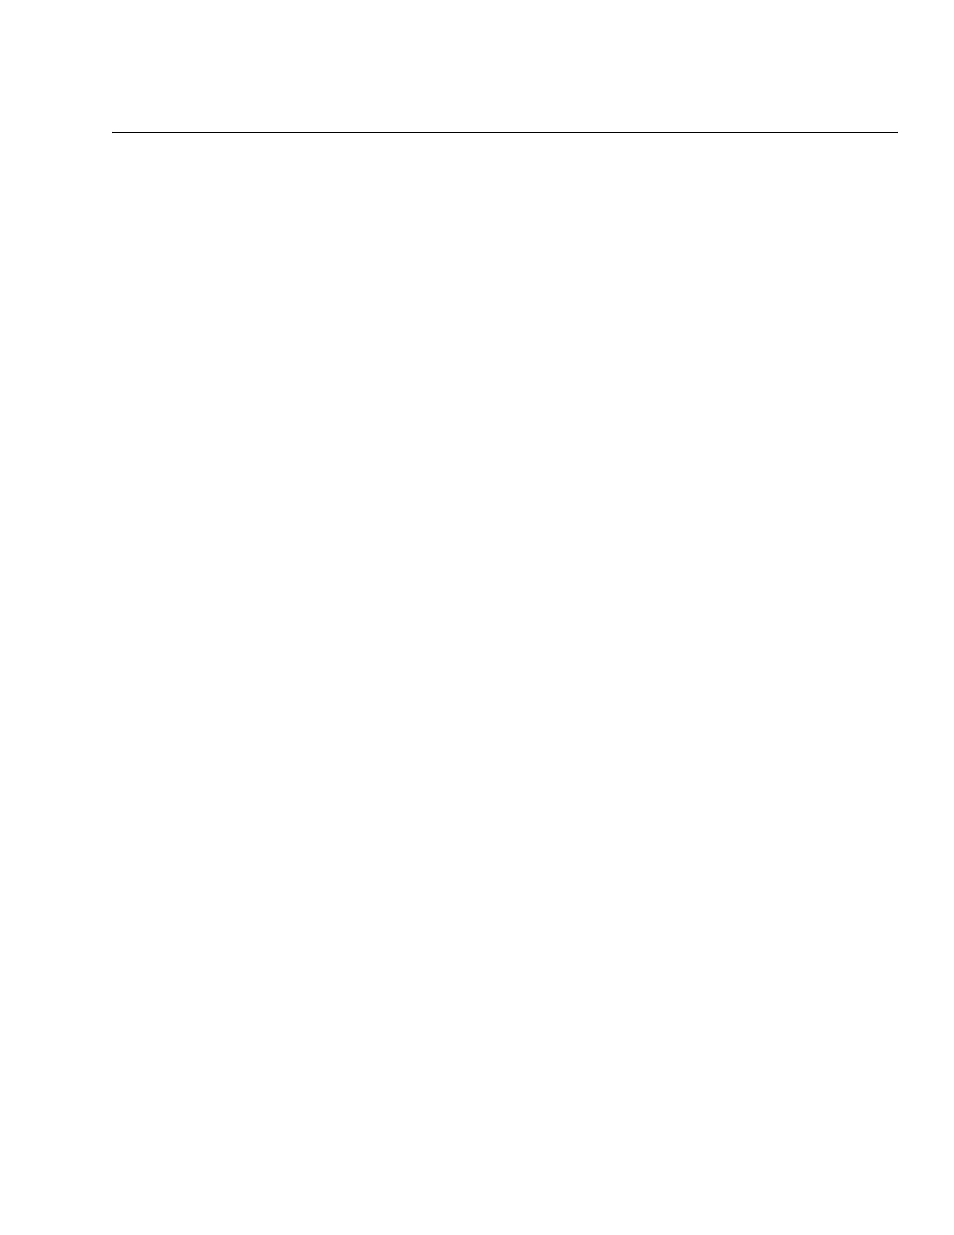 Ladder logic programming— including reading inputs